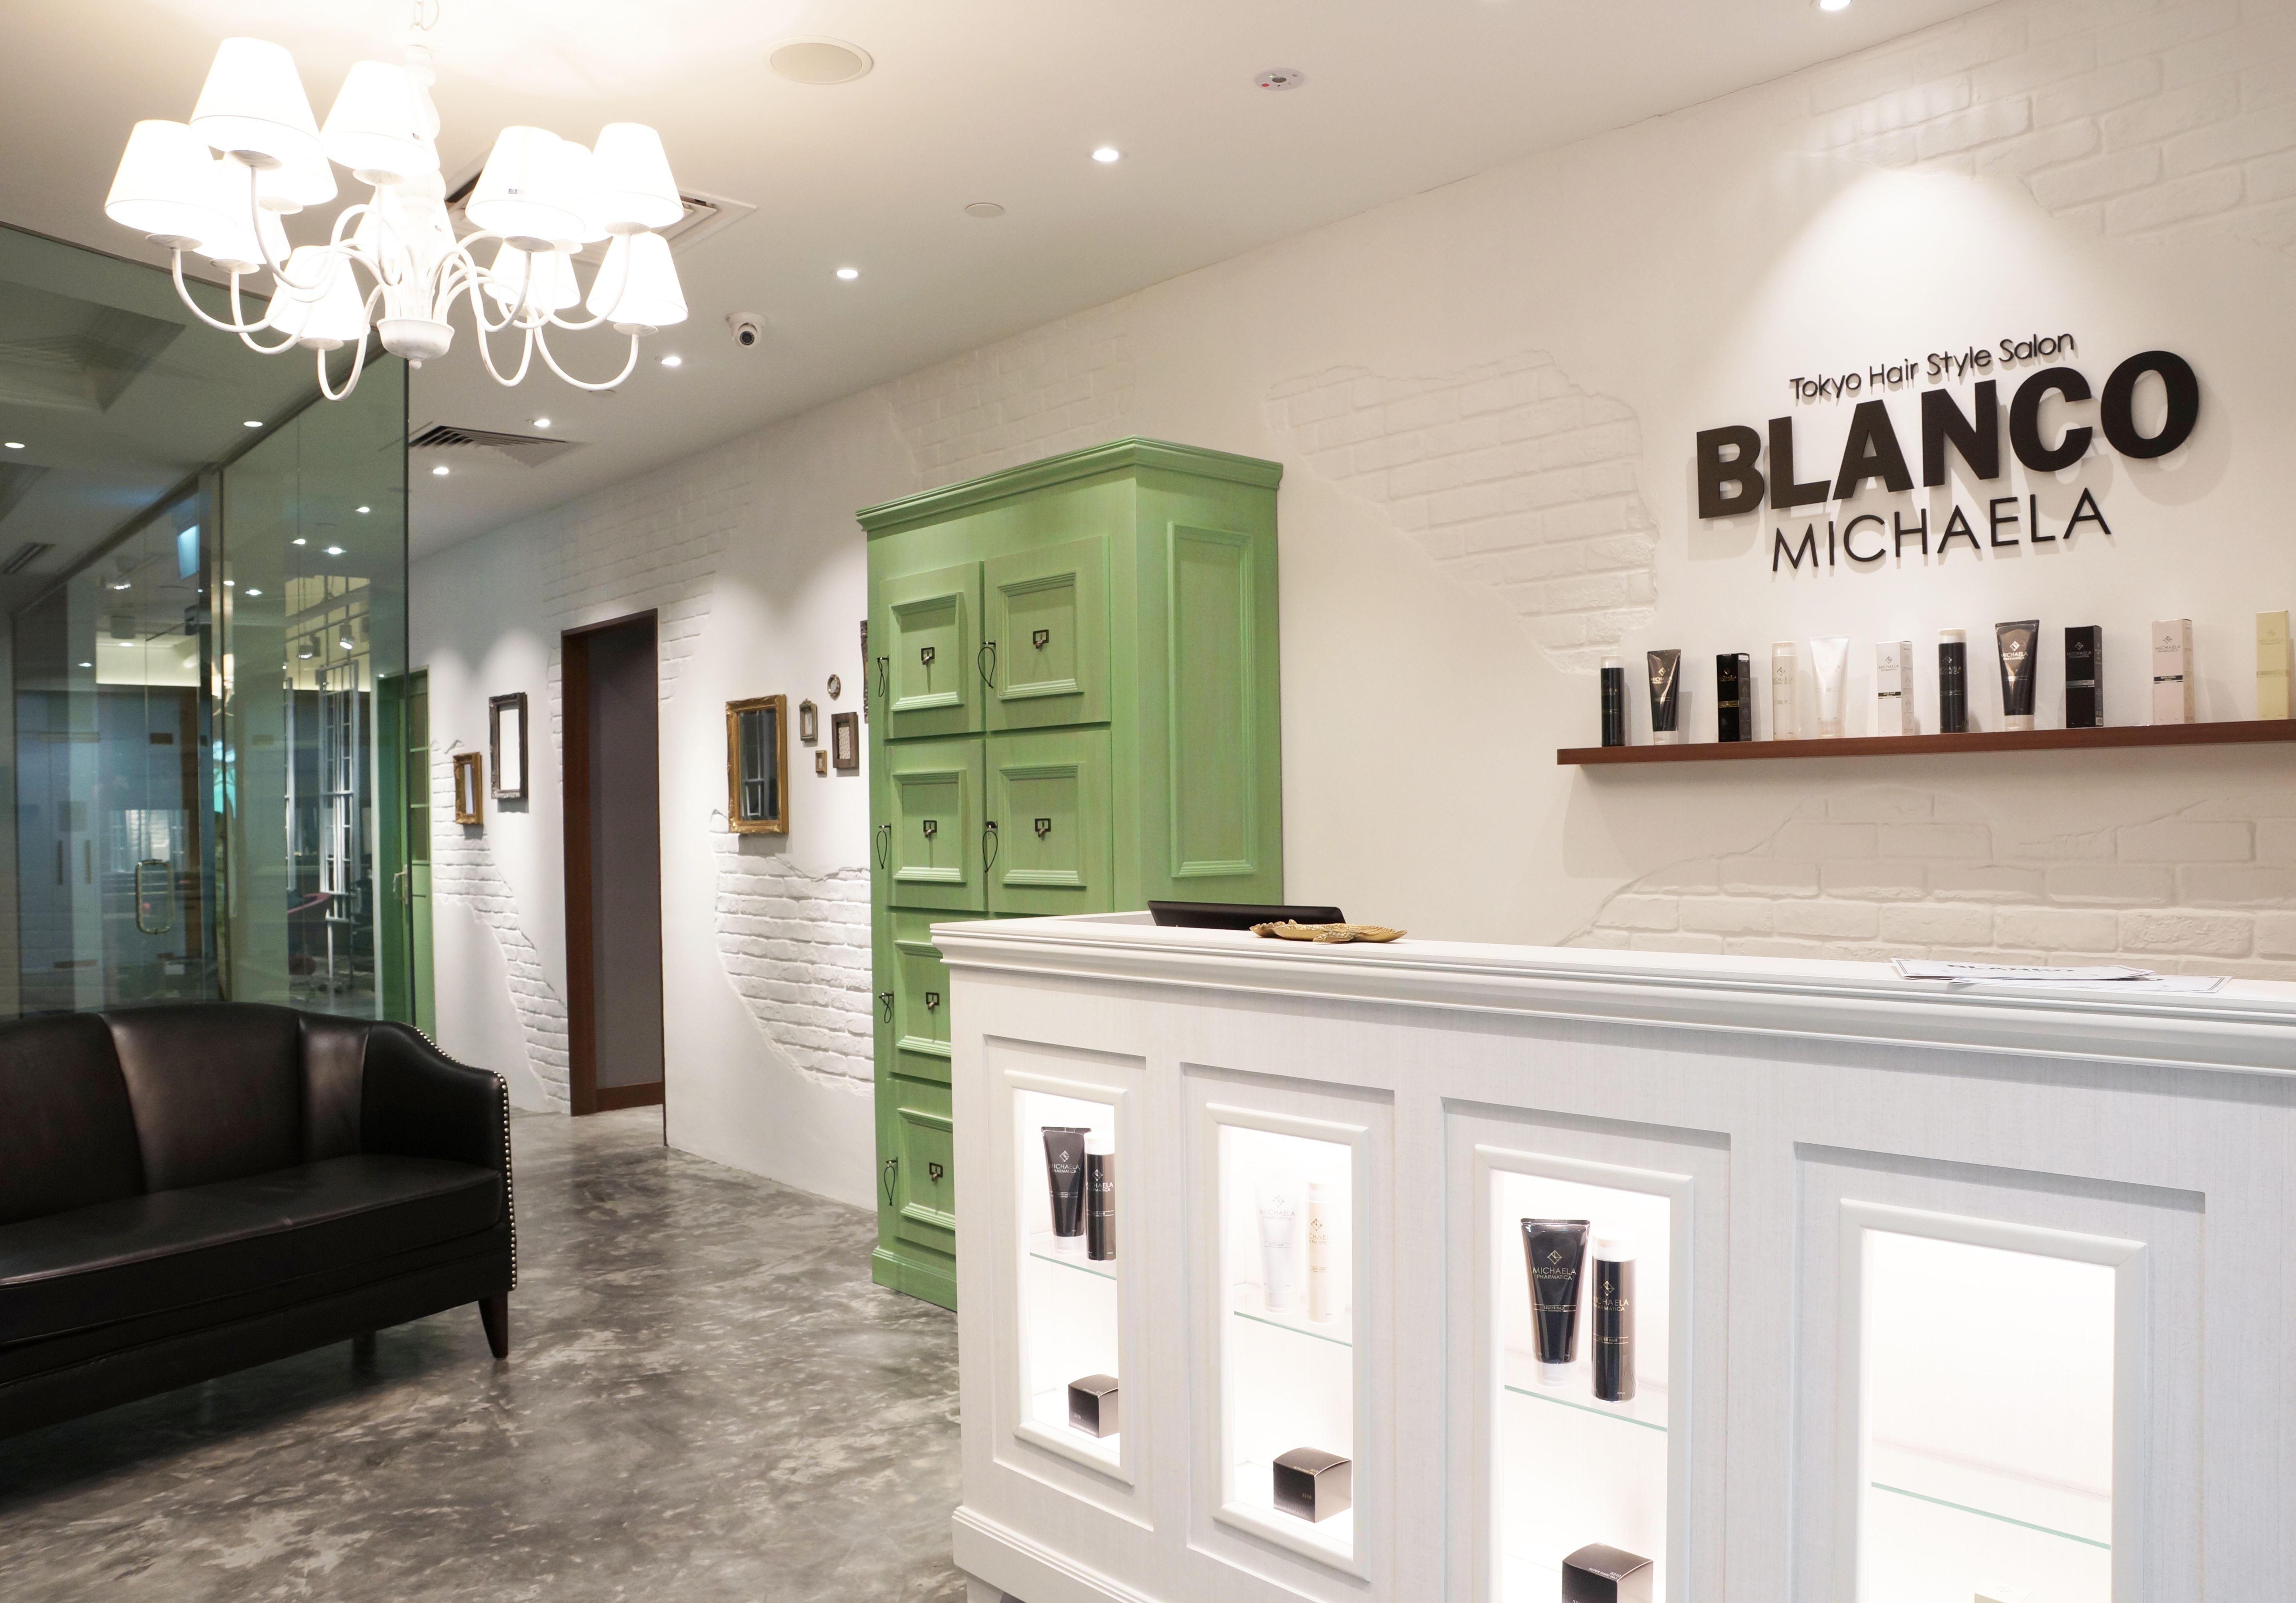 Japanese Hair salon BLANCO Michaela in SIngapore ...